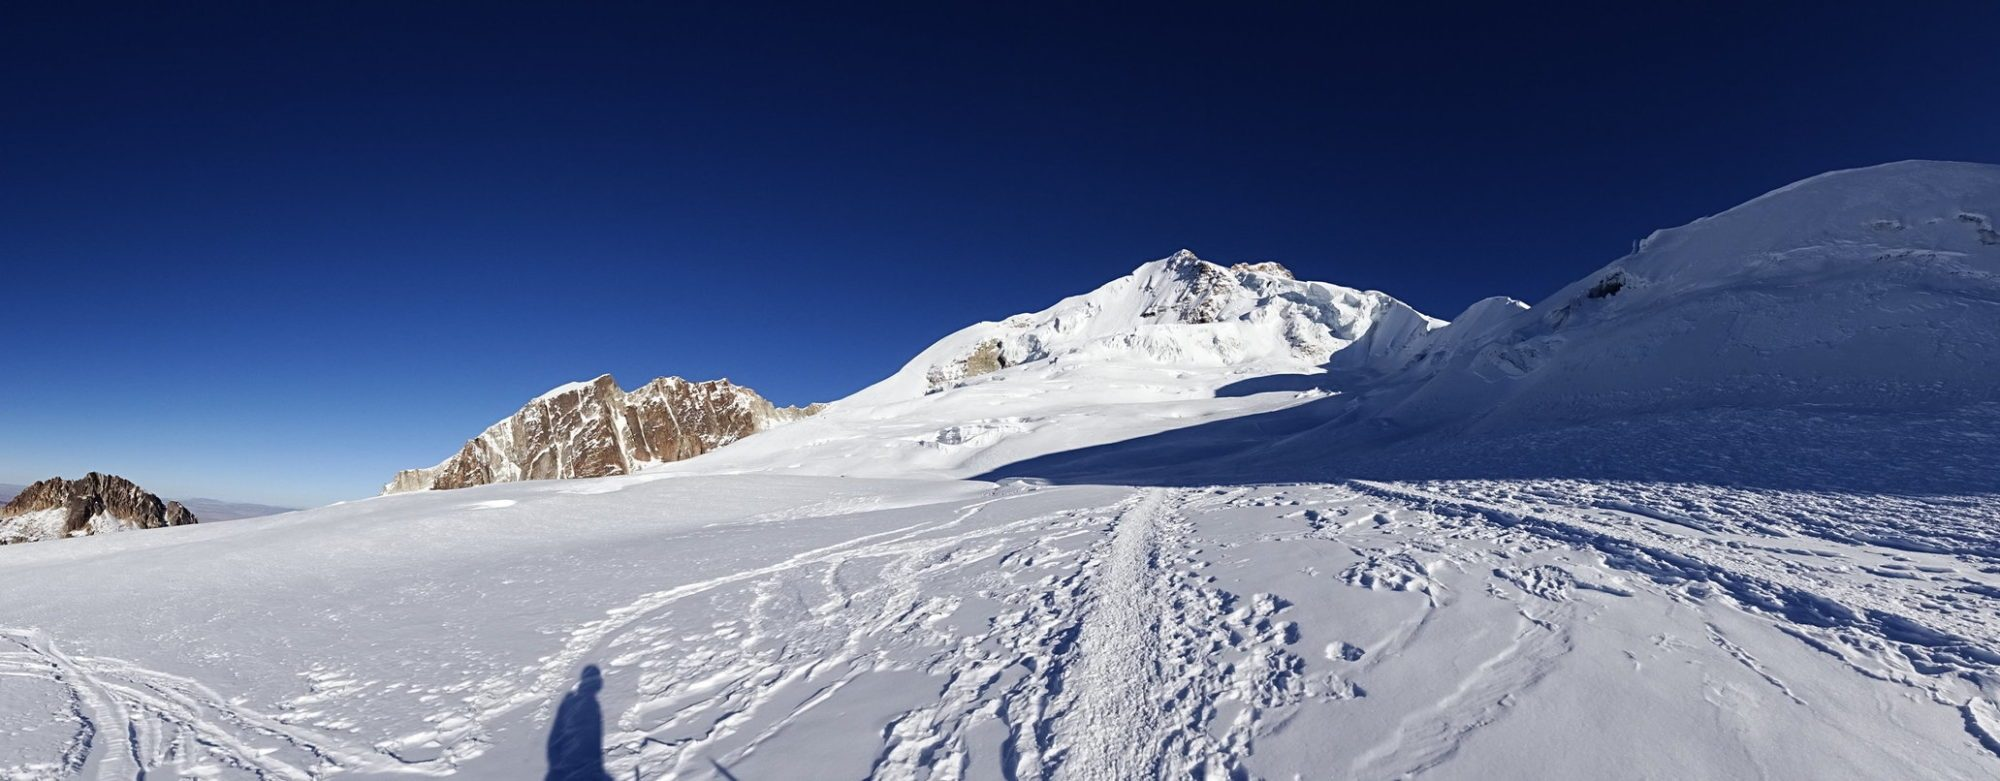 Panorama du Huayna Potosi depuis le campo Argentino